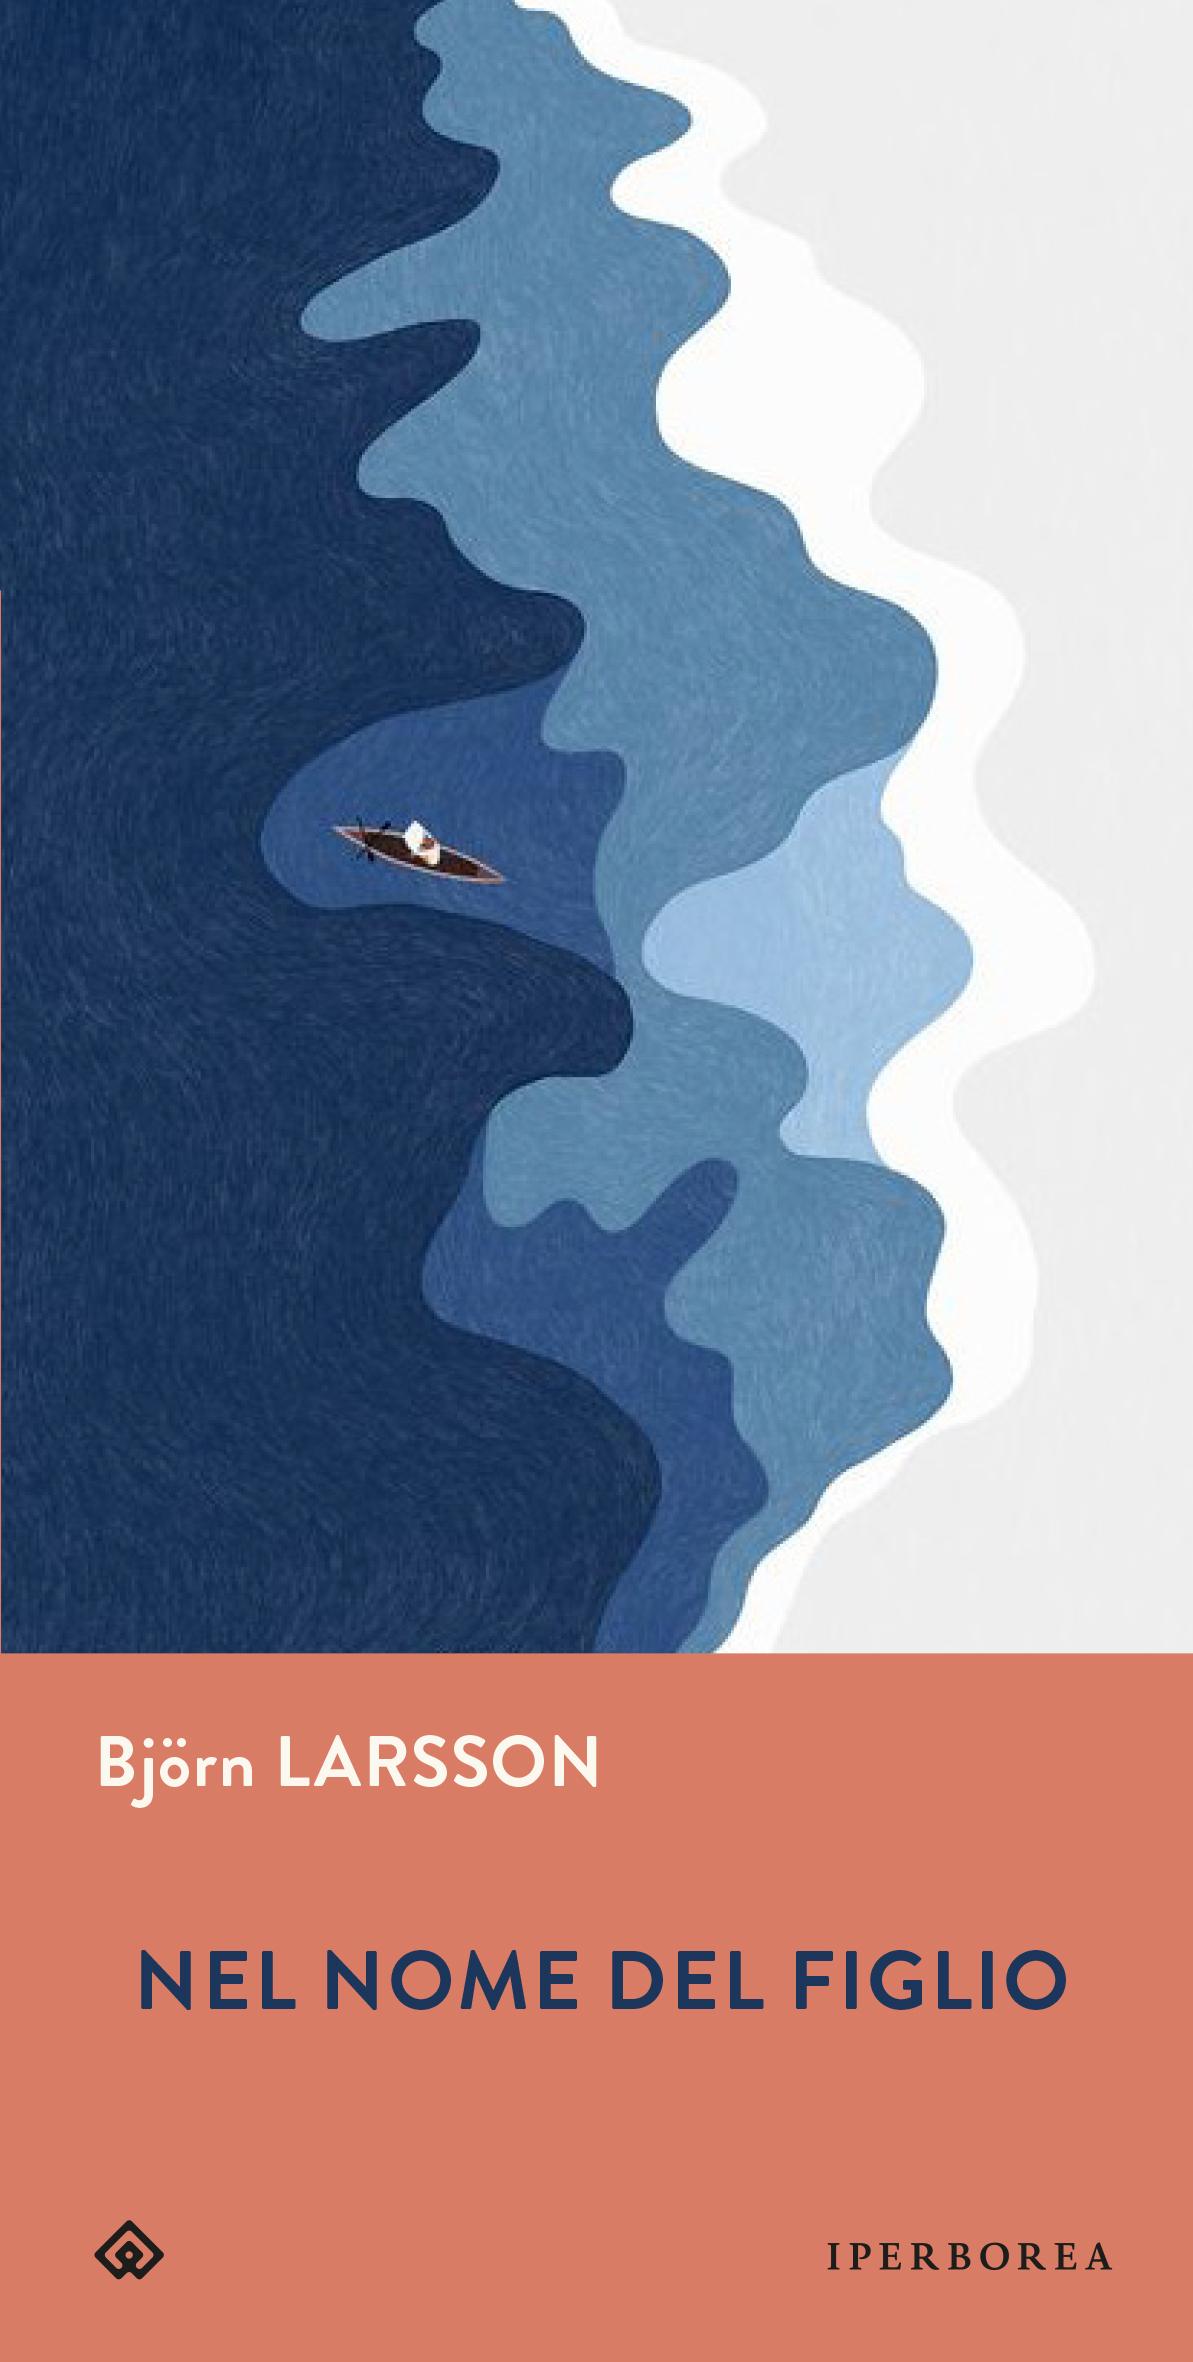 Björn LARSSON libri da leggere